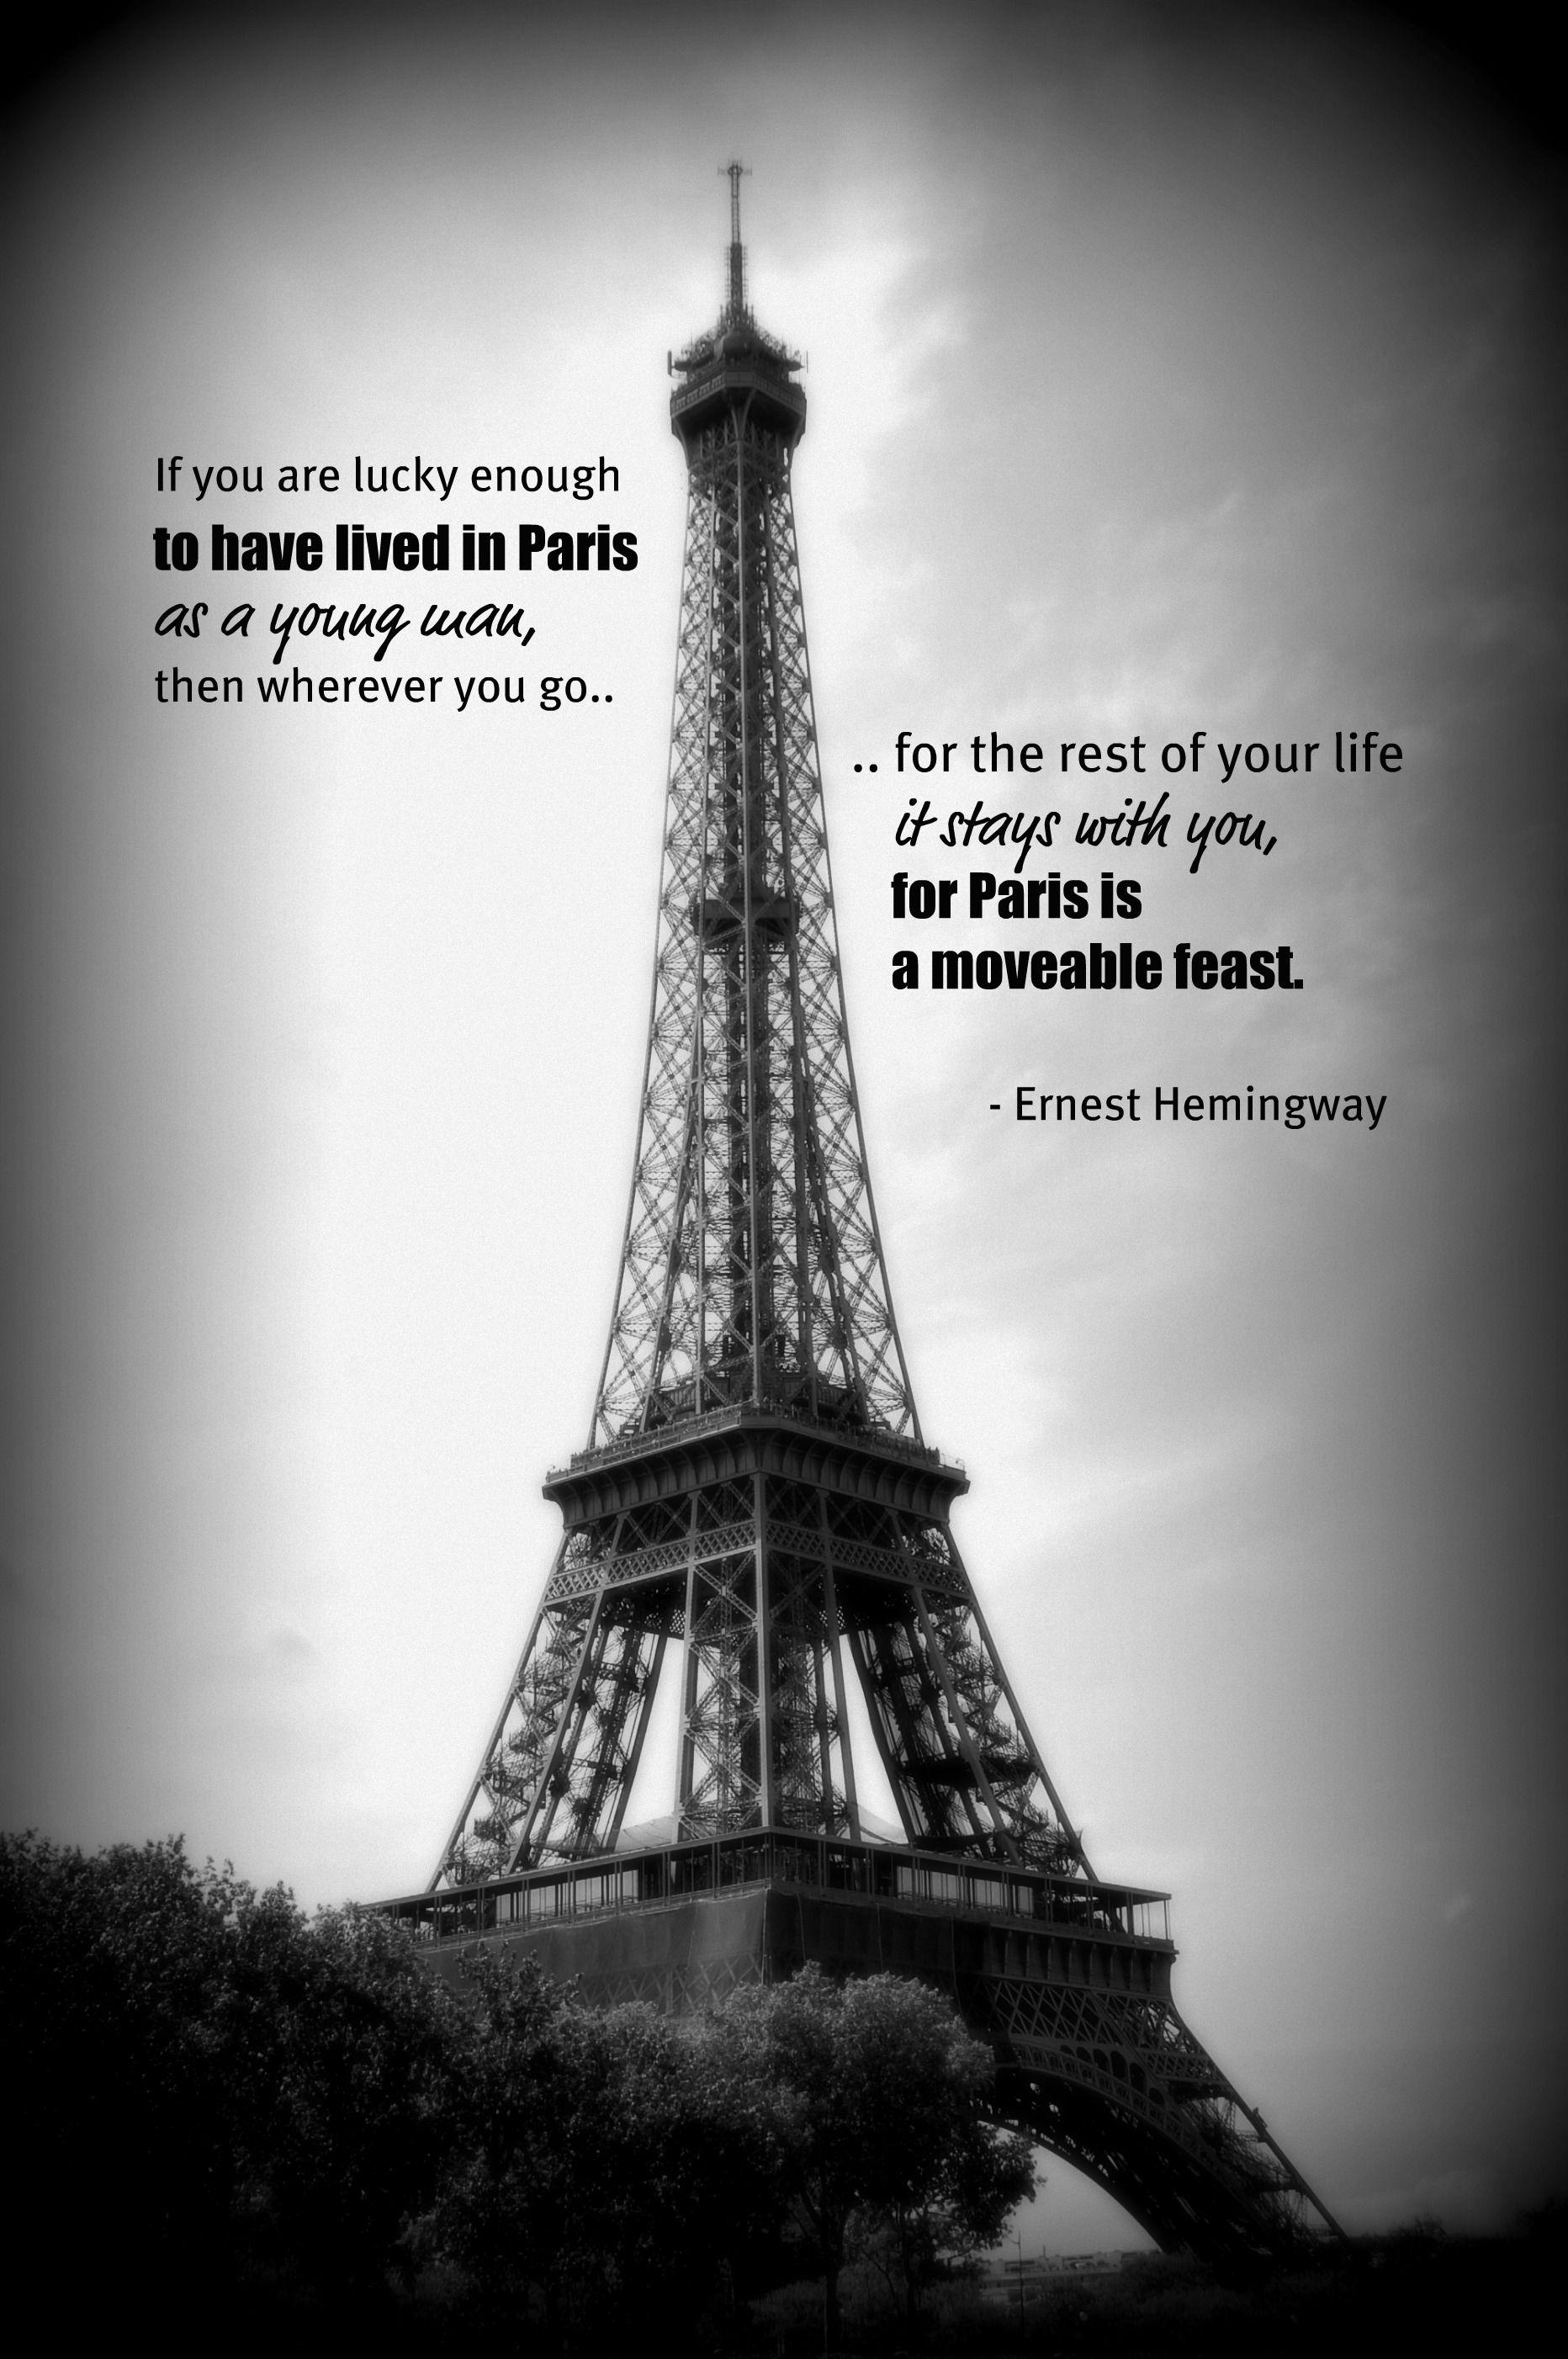 A Moveable Feast Beautiful Words Pinterest Paris